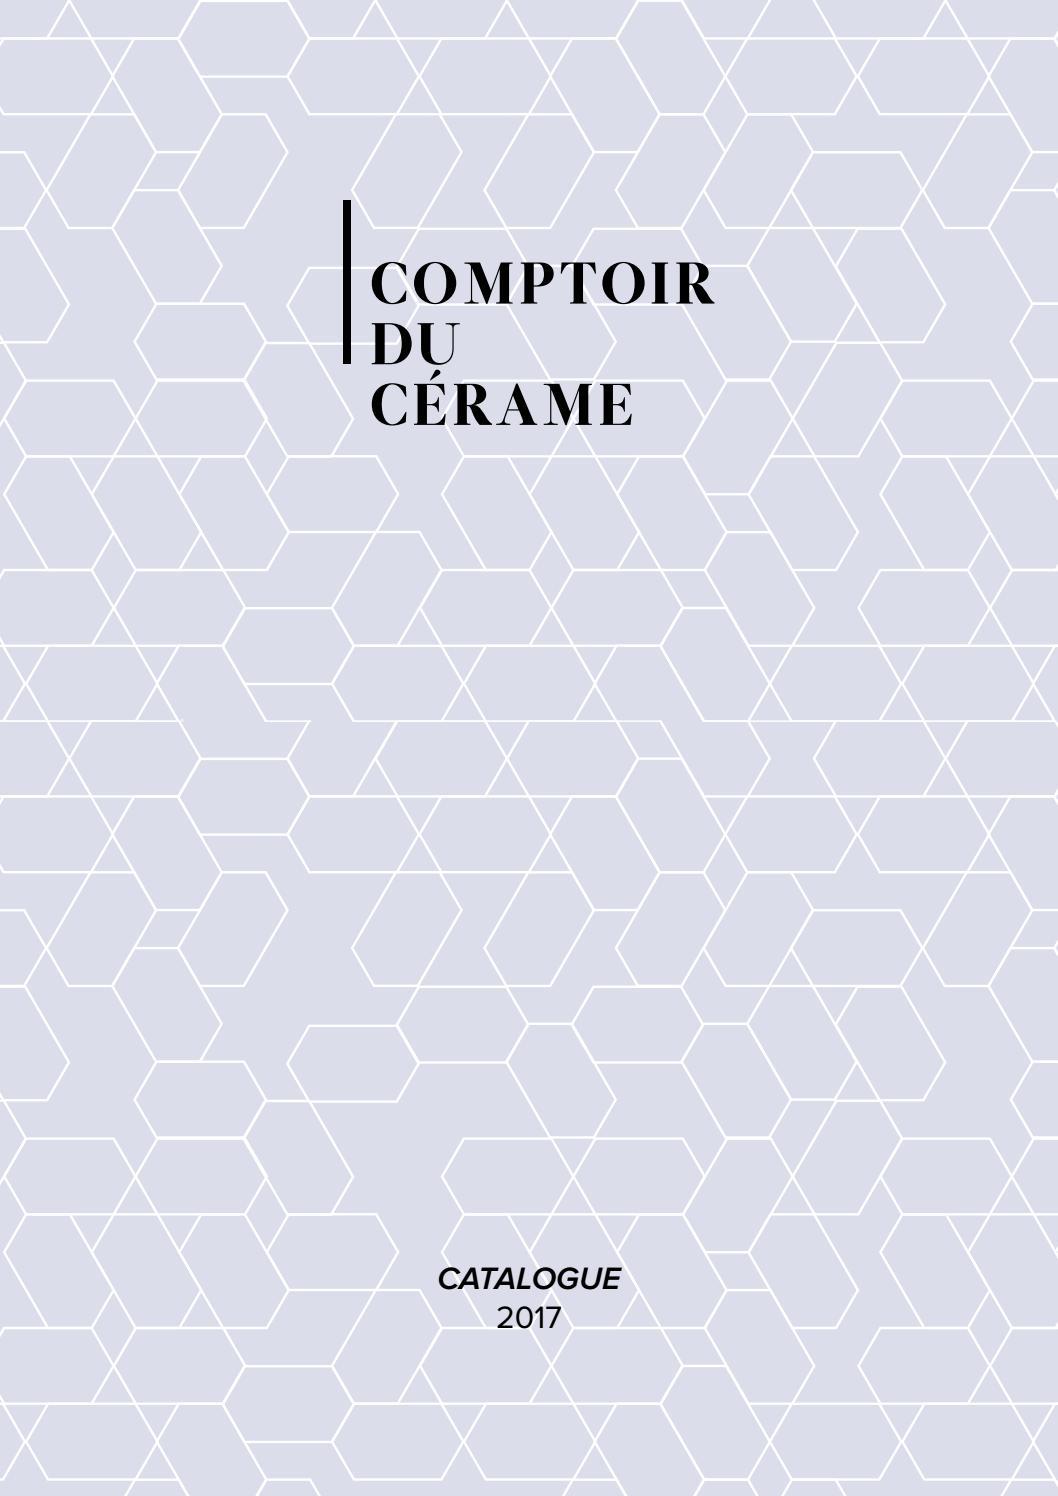 catalogue comptoir du c rame 2017 by comptoir du cerame issuu. Black Bedroom Furniture Sets. Home Design Ideas